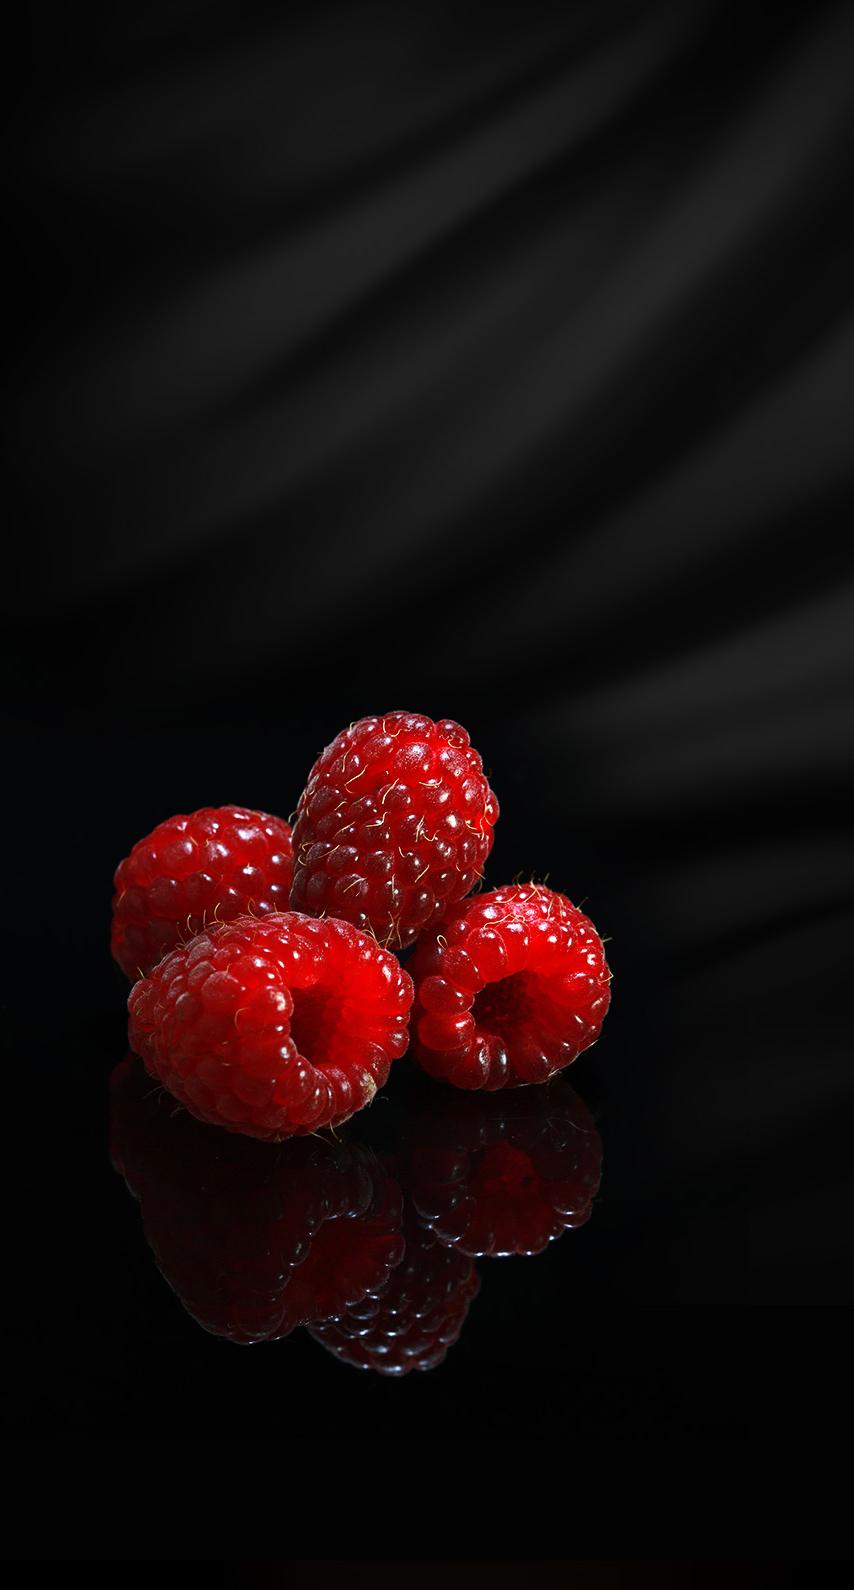 fruit, berry